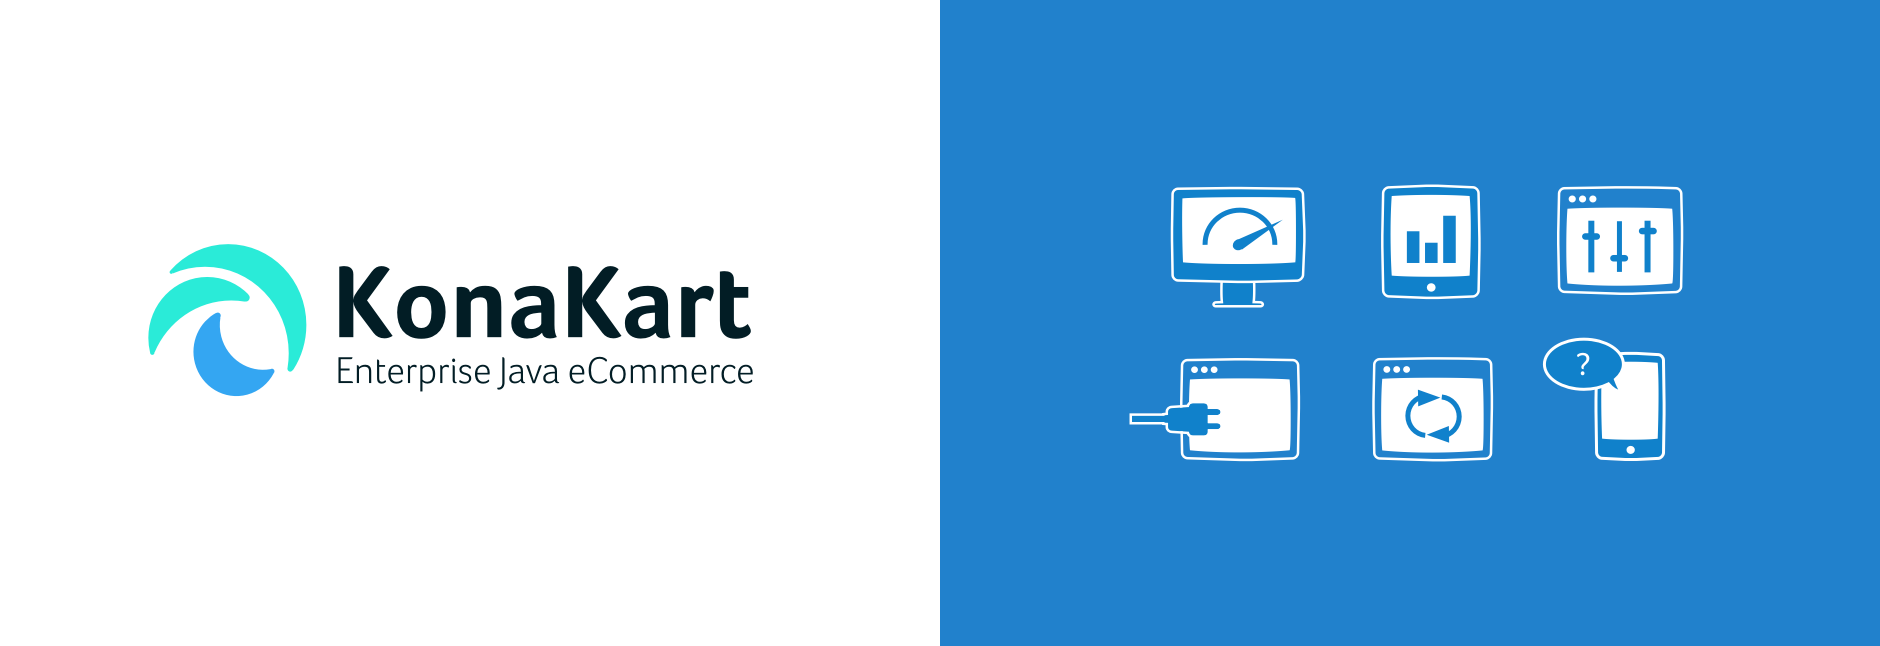 konakart-logo-icons